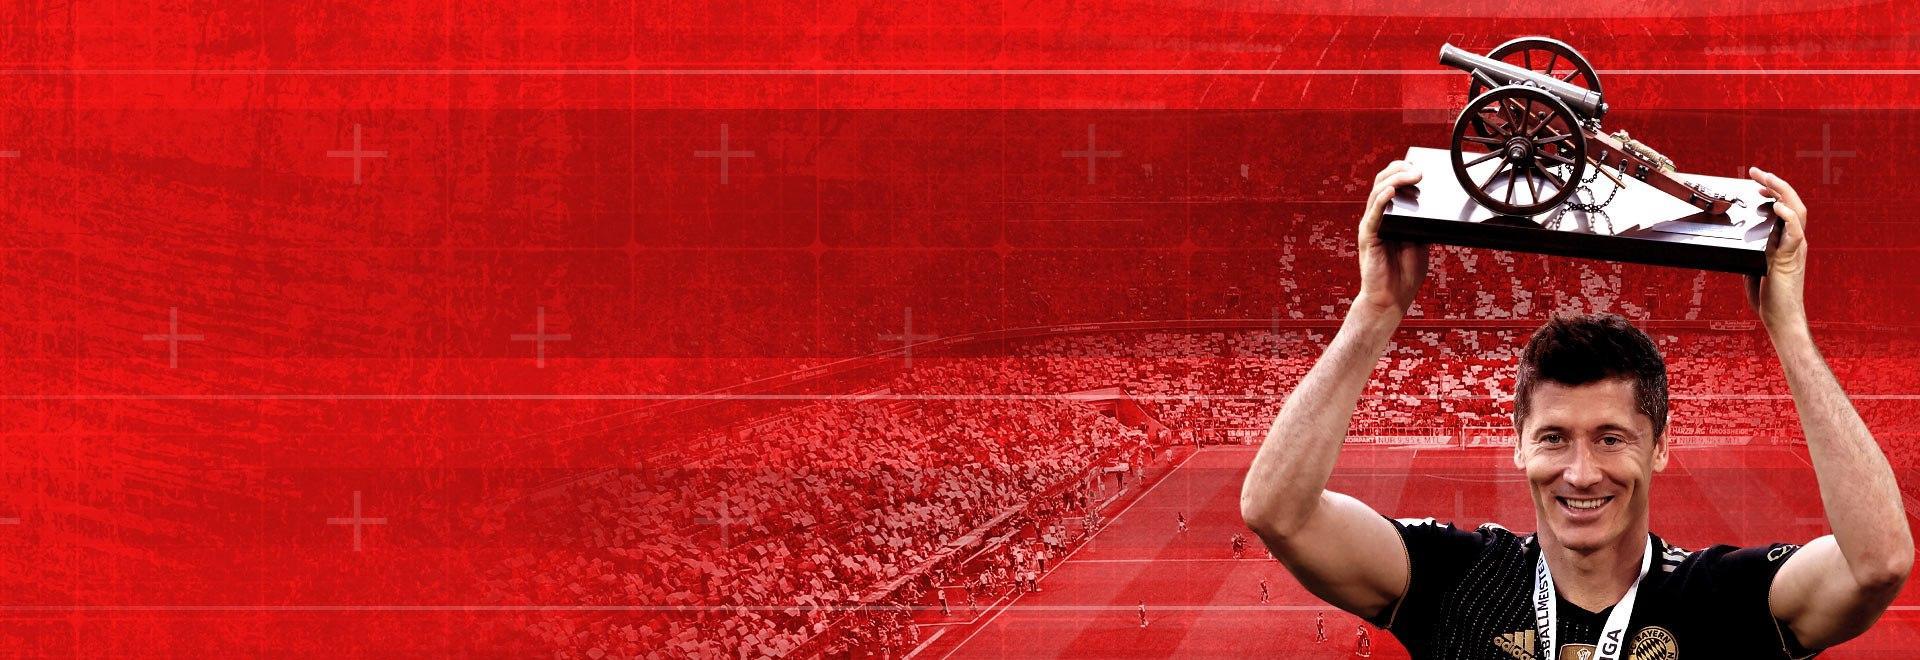 Lewandowski, l'uomo dei record